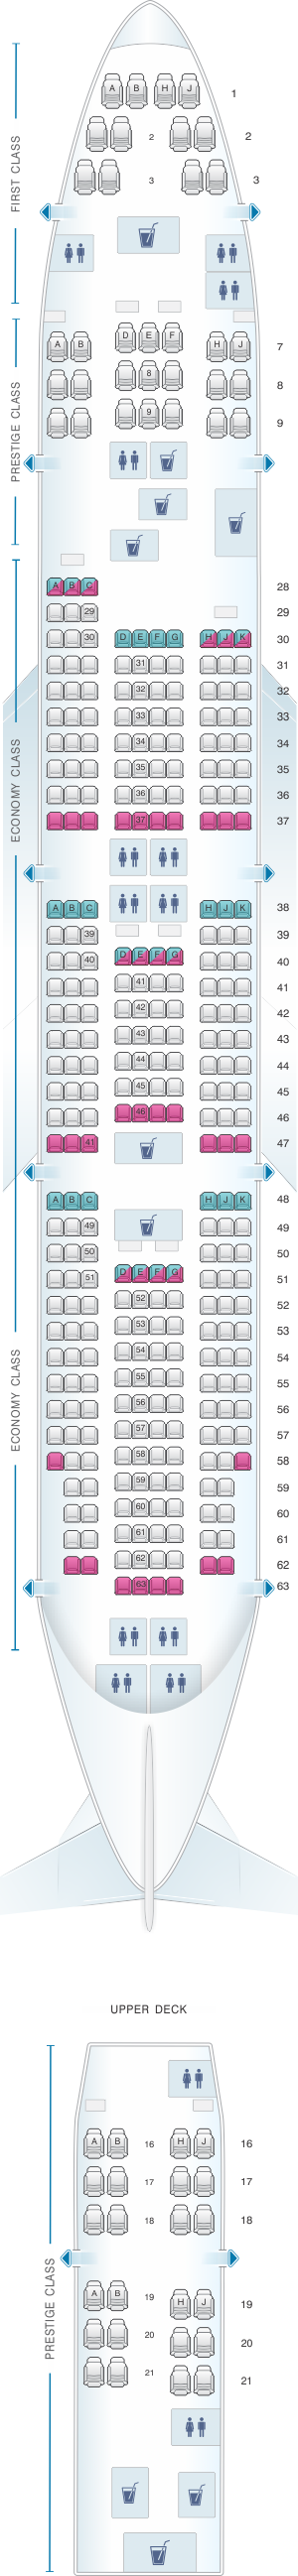 Seat map for Korean Air Boeing B747 400 365PAX